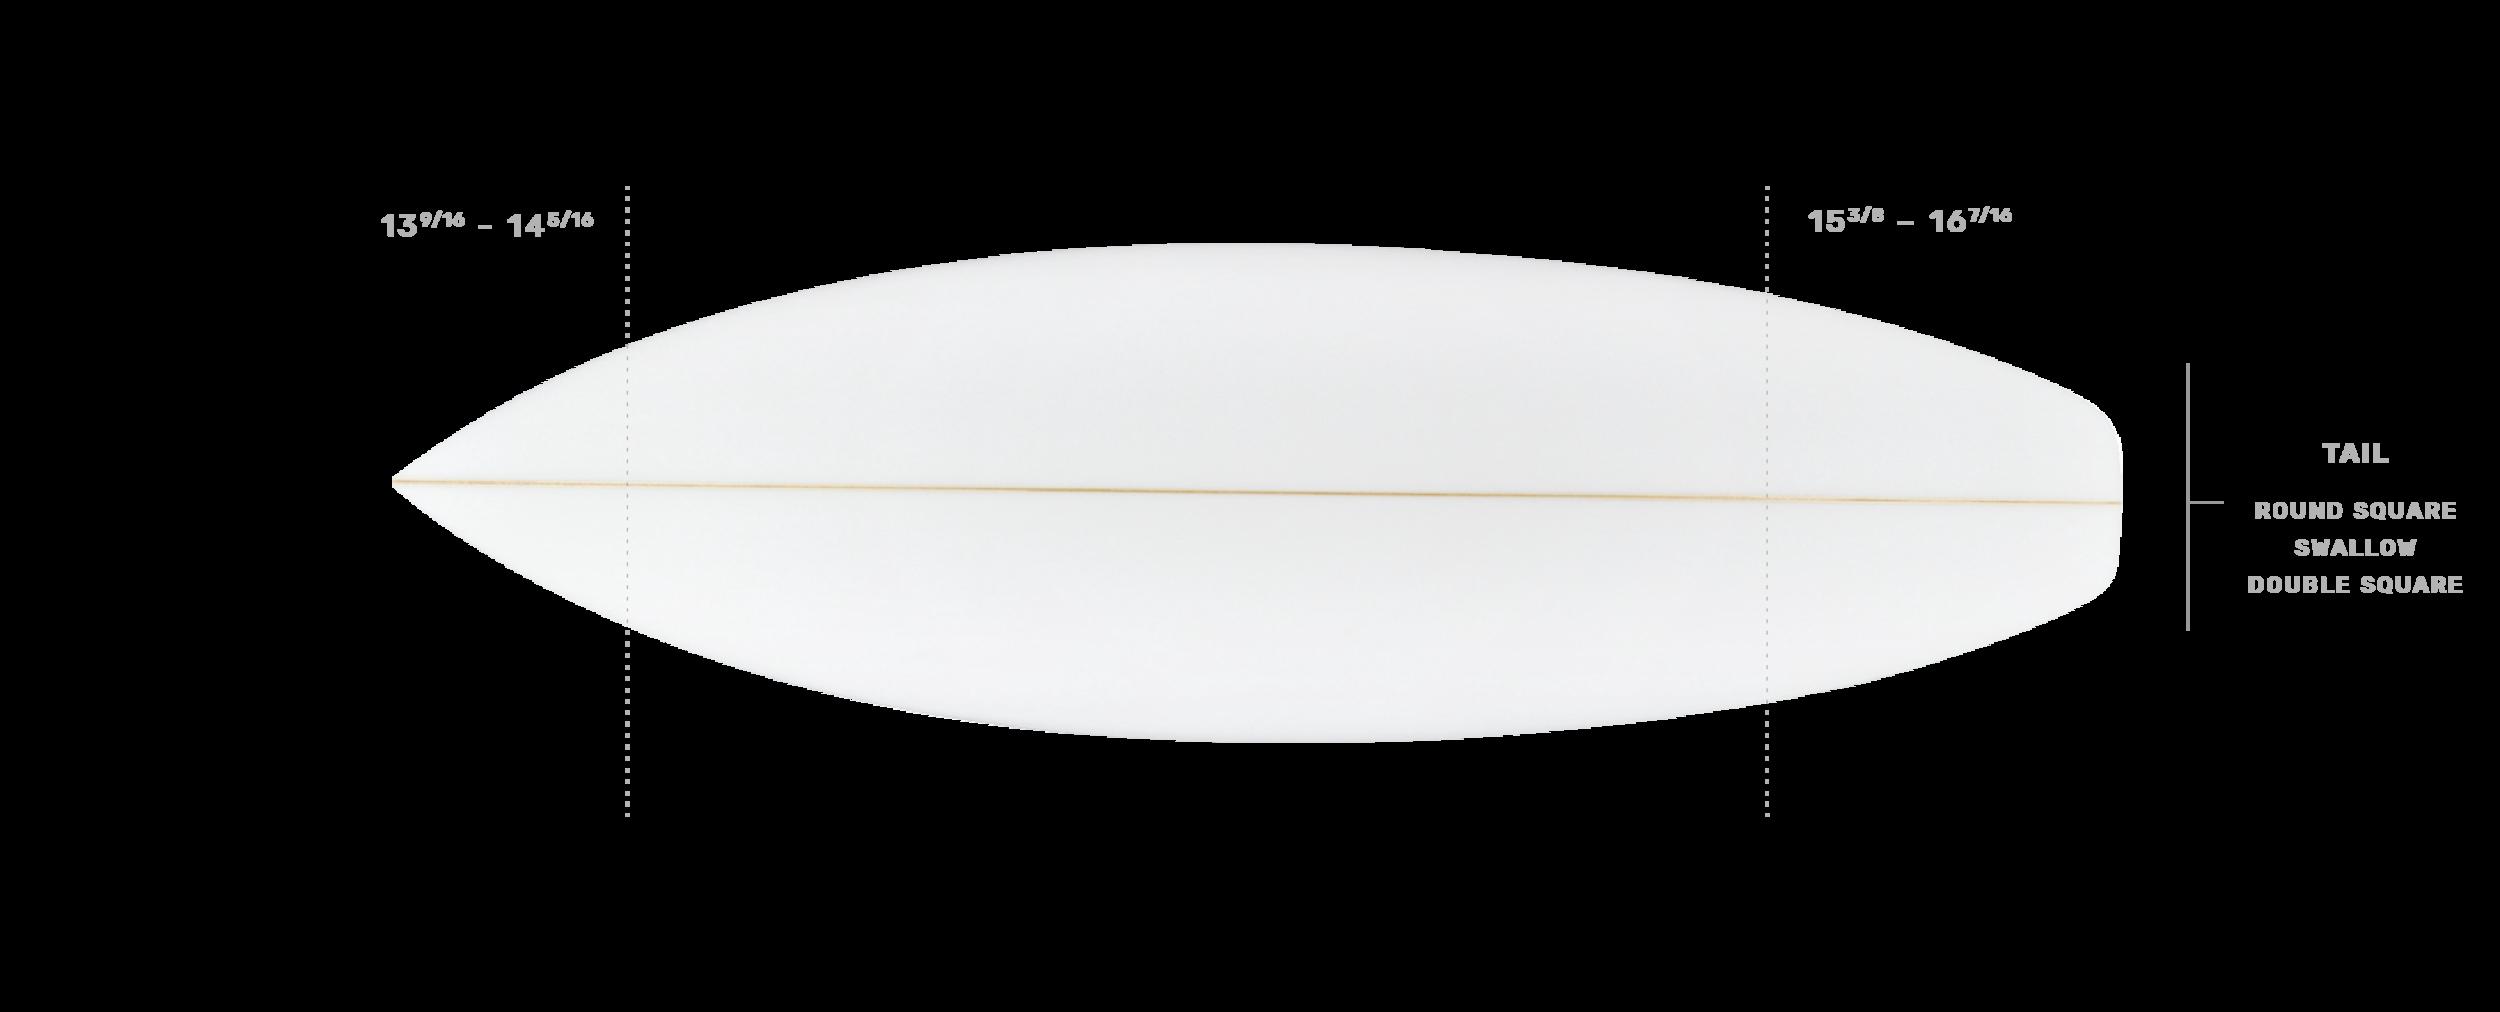 Takeda-custom-board-specs-TKD-MODELS-TKDIV-deck.png